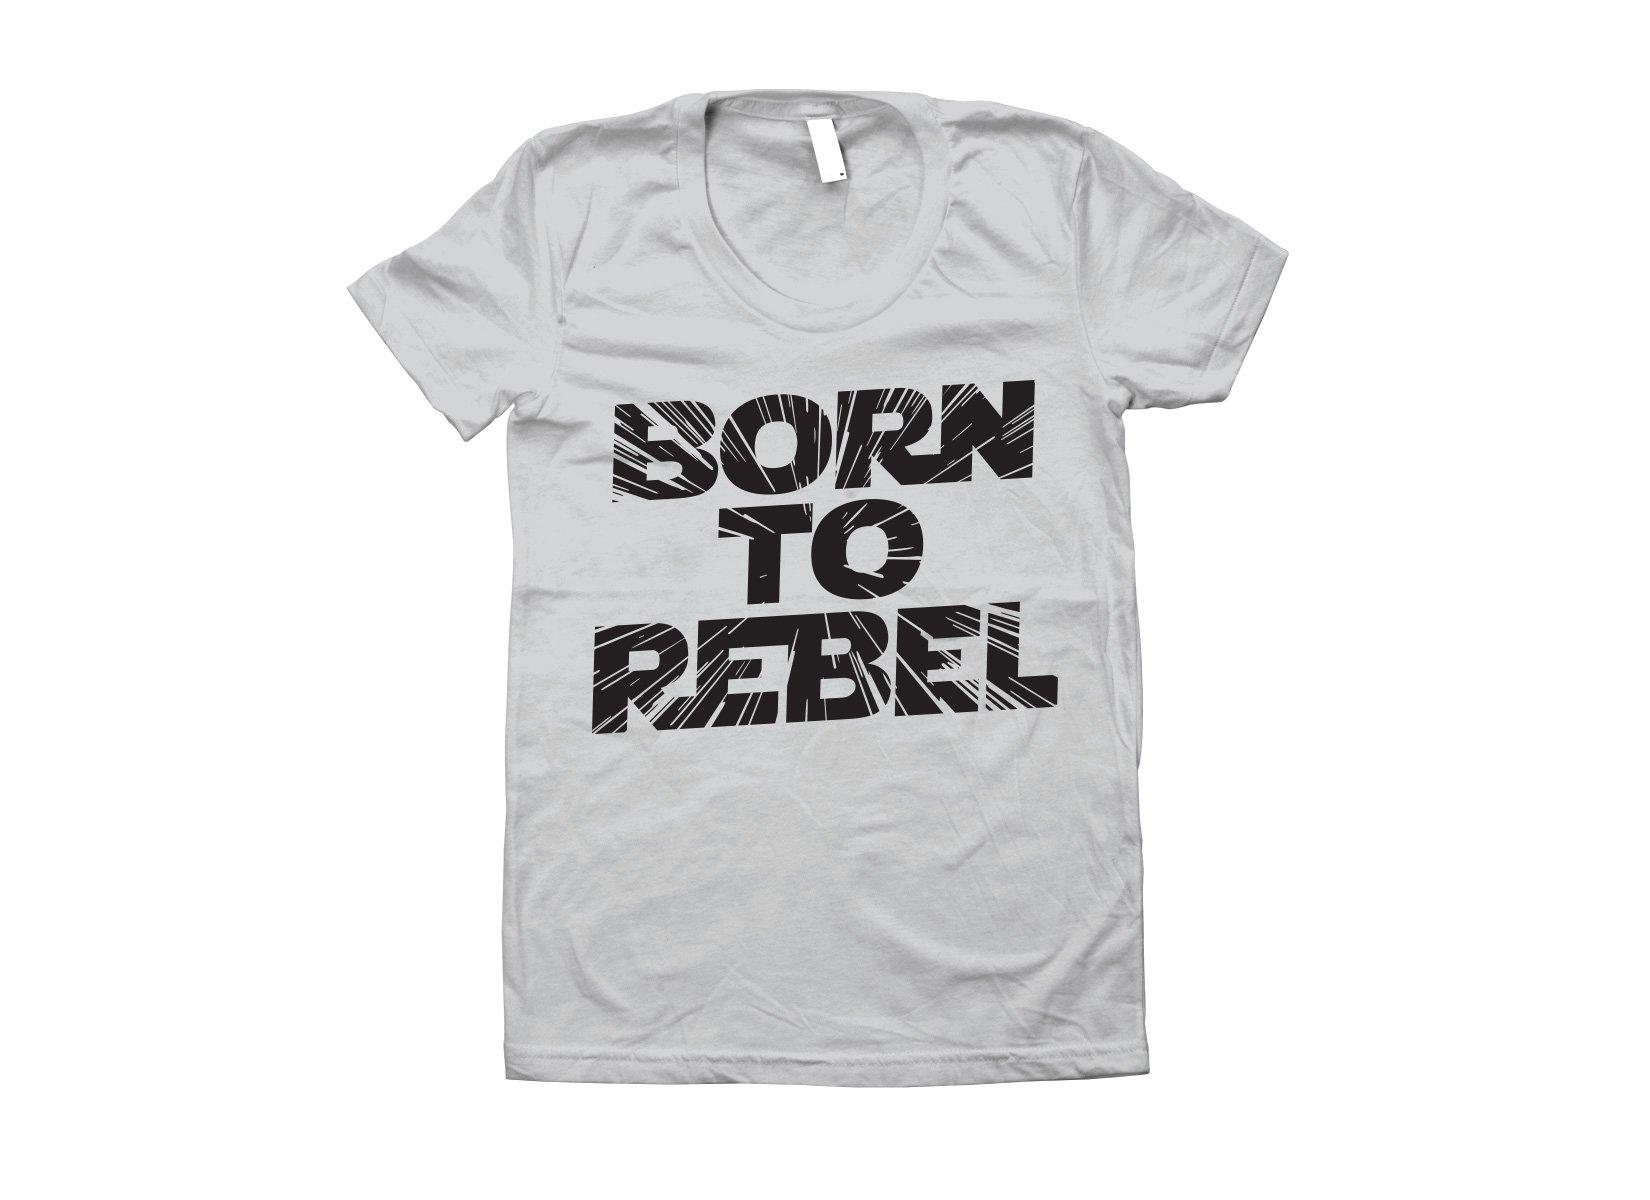 Born To Rebel on Juniors T-Shirt